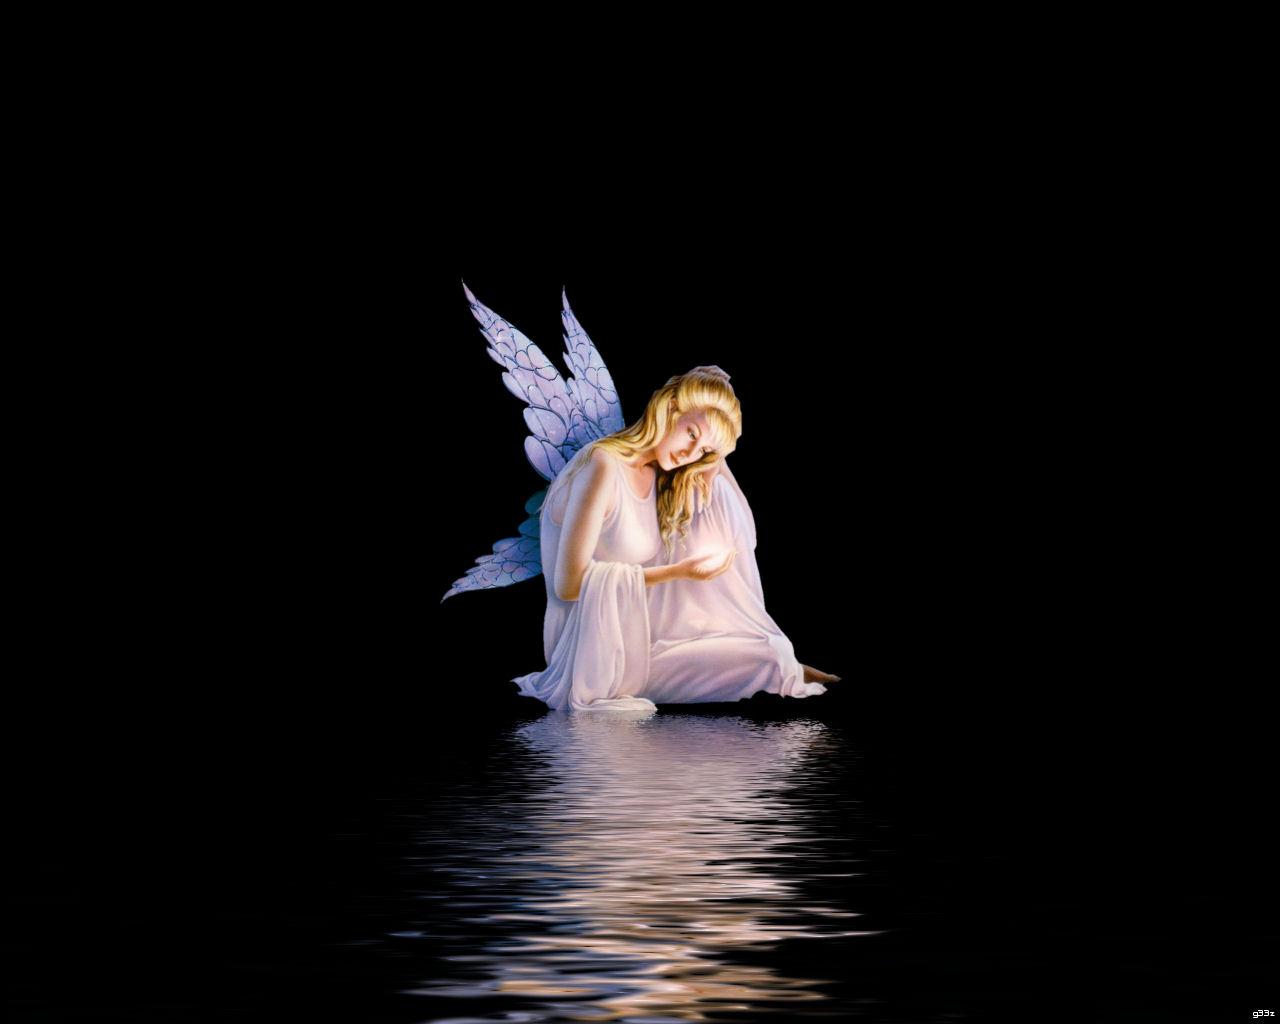 http://1.bp.blogspot.com/_tbttKdkZYYw/TAi7KGkmwtI/AAAAAAAABvw/RqlYSfS8GOk/s1600/night-angel-643730.jpg